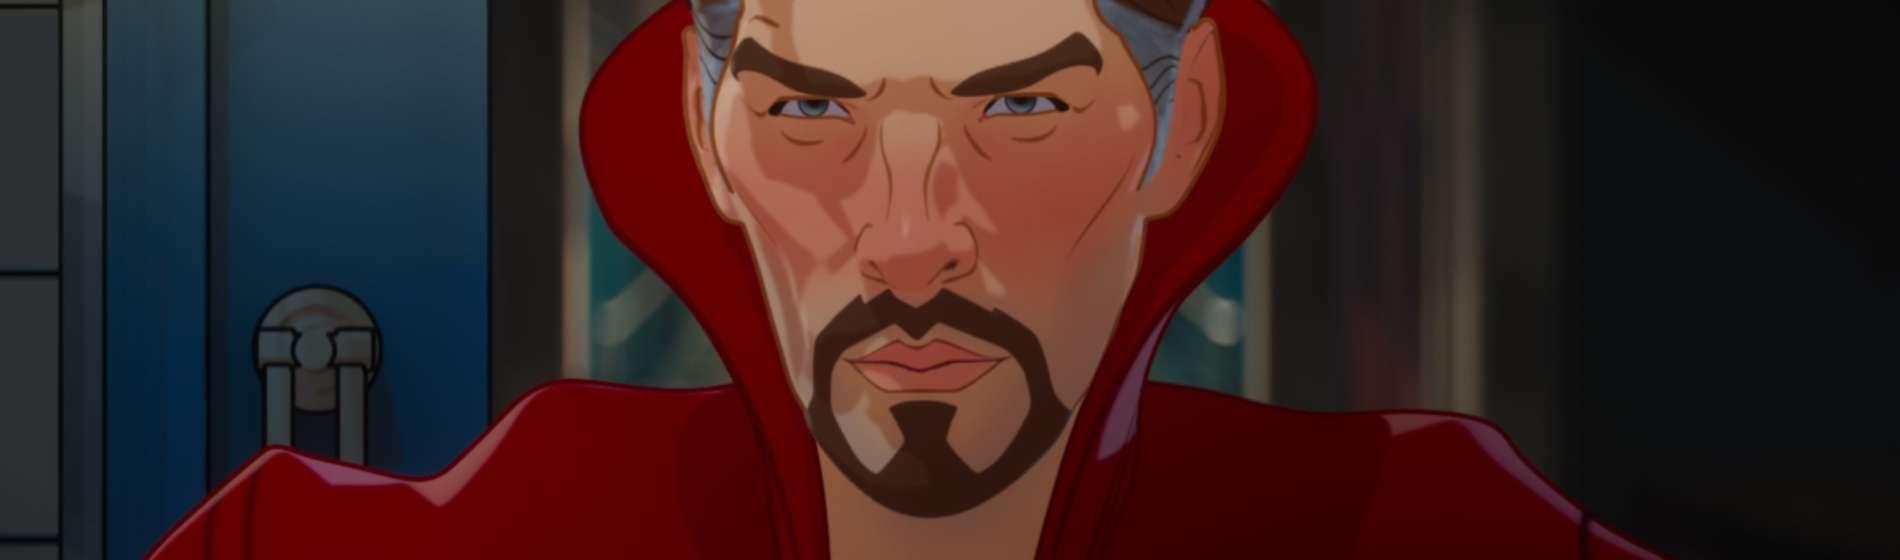 Disney+-Doctor-Strange-Feature-Image